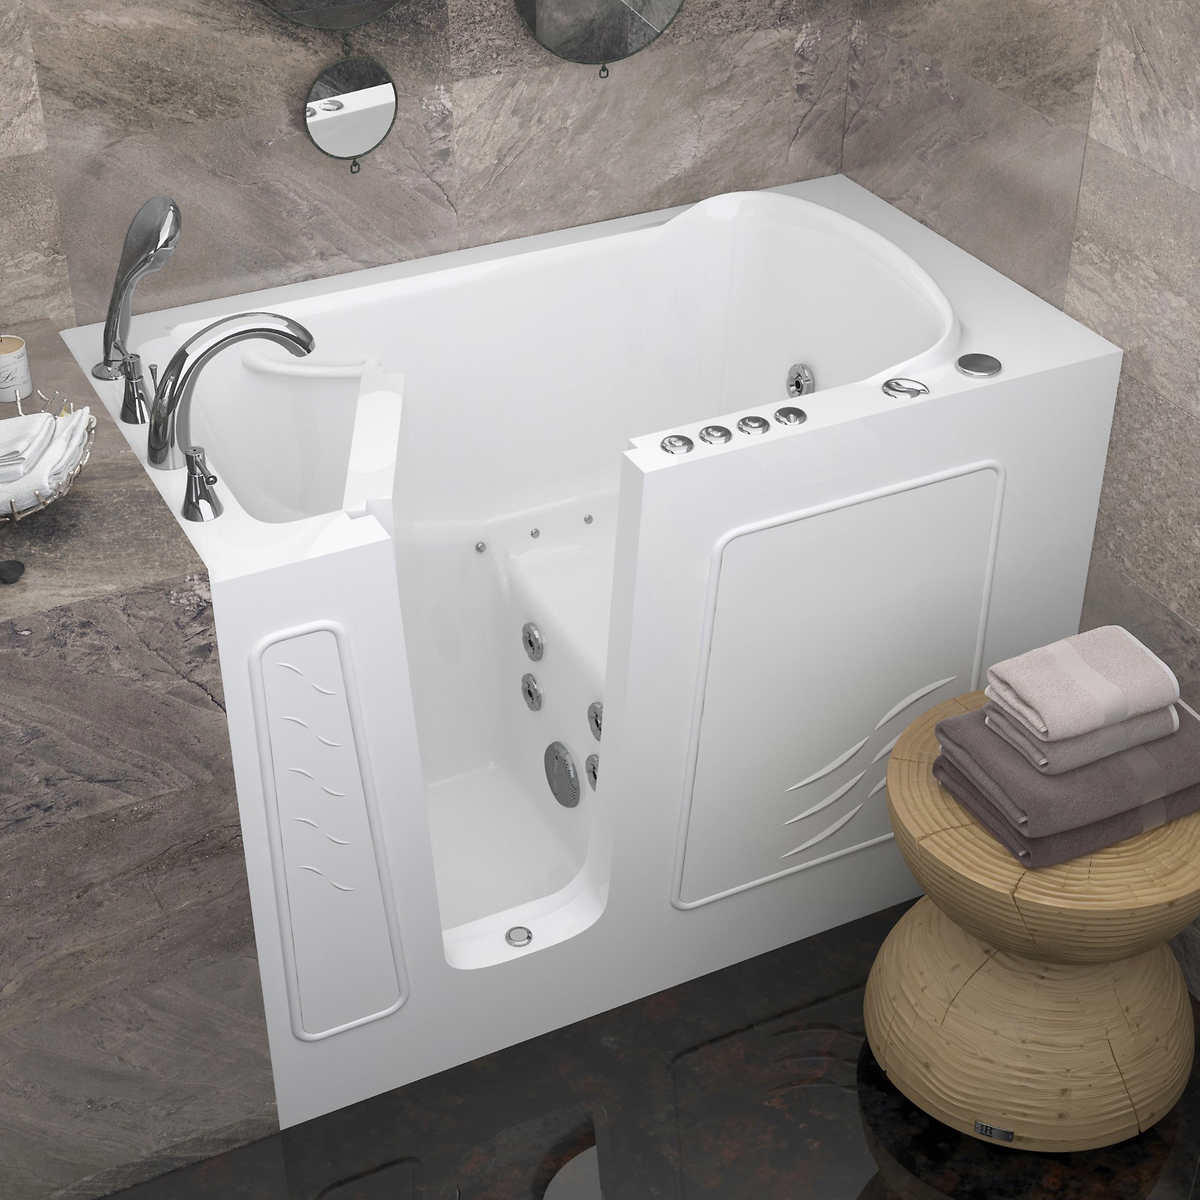 Bathroom Faucets Jacuzzi tubs | costco